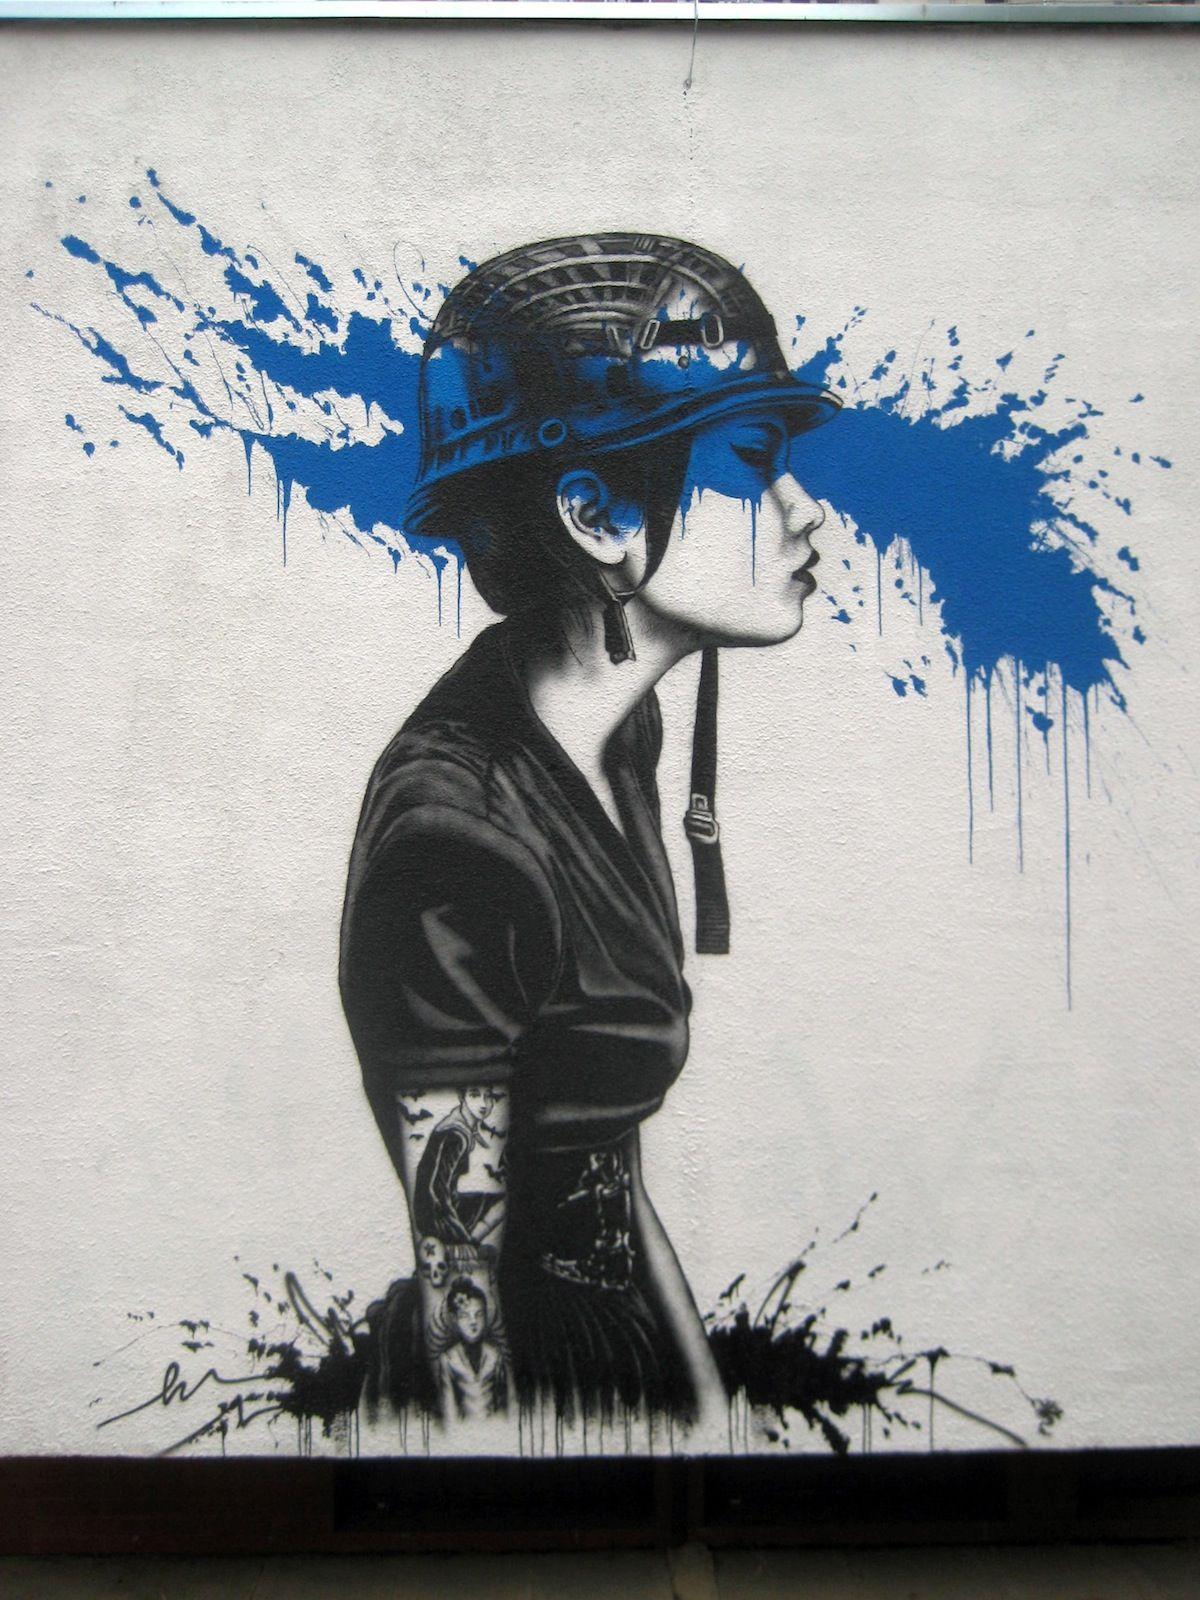 Pin De Rtm En Arte Graffiti De Arte Callejero Arte Fotografico Arte Urbano